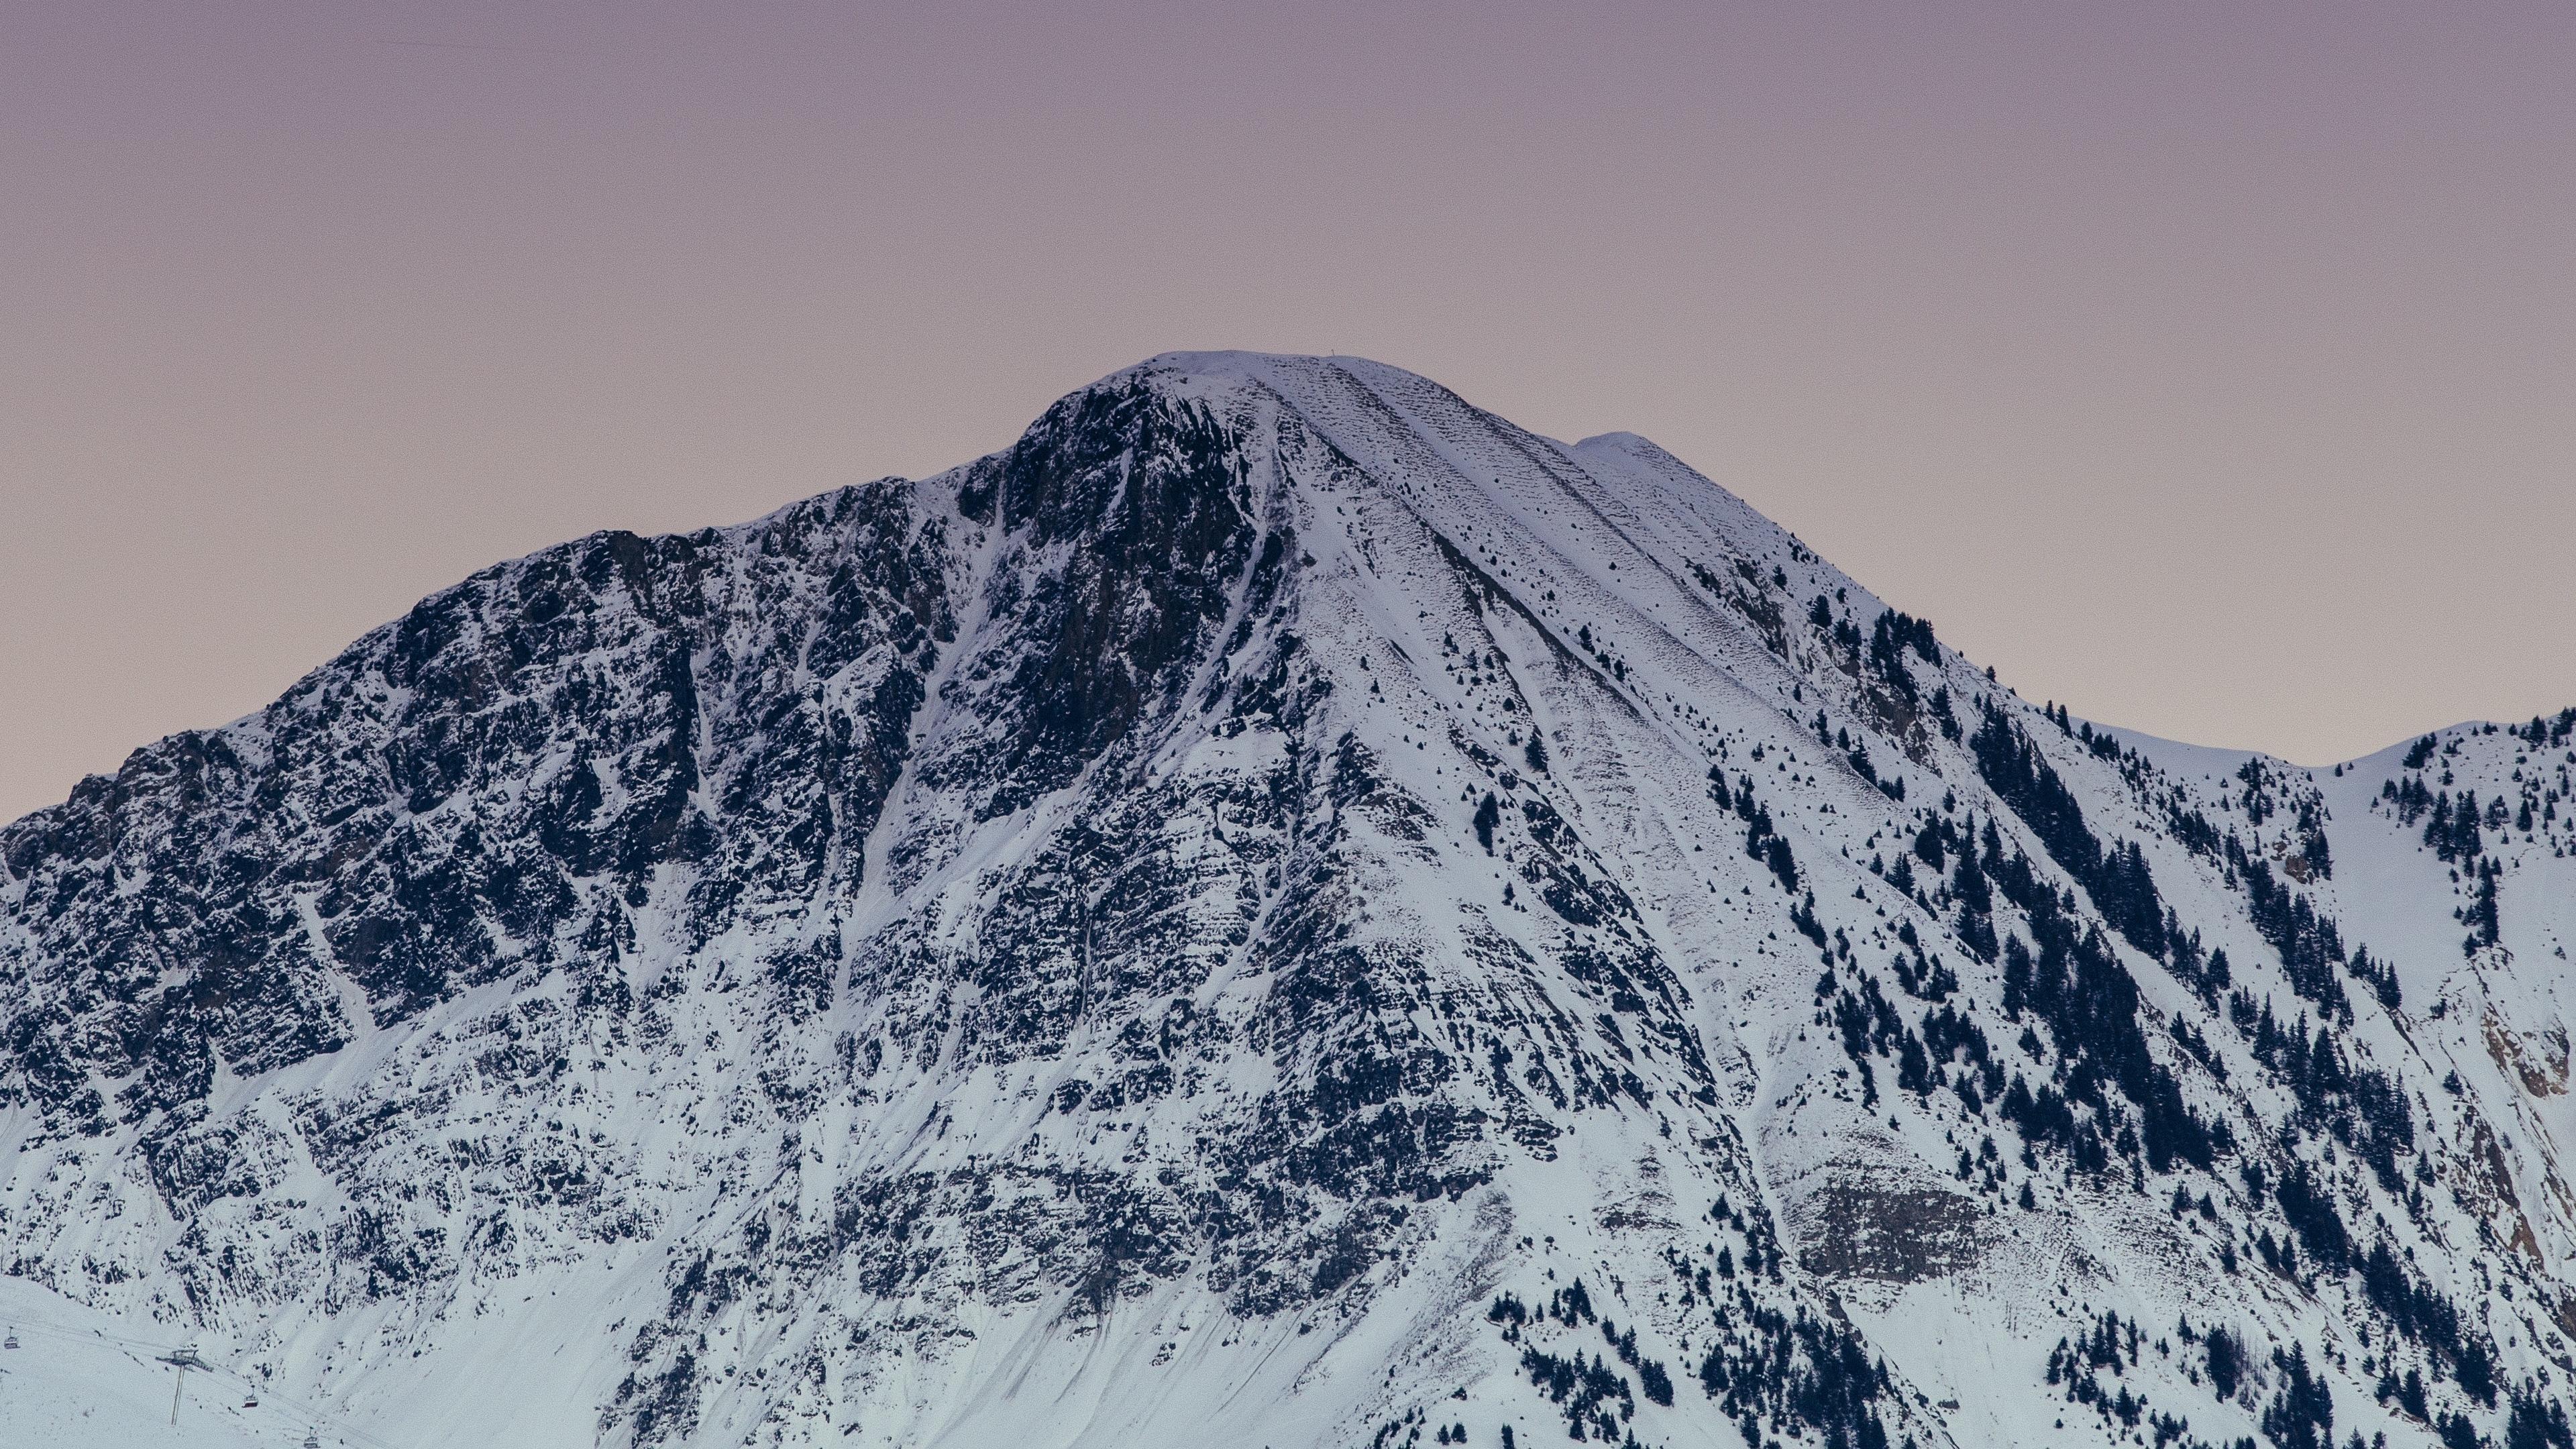 mountain peak snowy snow twilight 4k 1541113723 - mountain, peak, snowy, snow, twilight 4k - Snowy, peak, Mountain